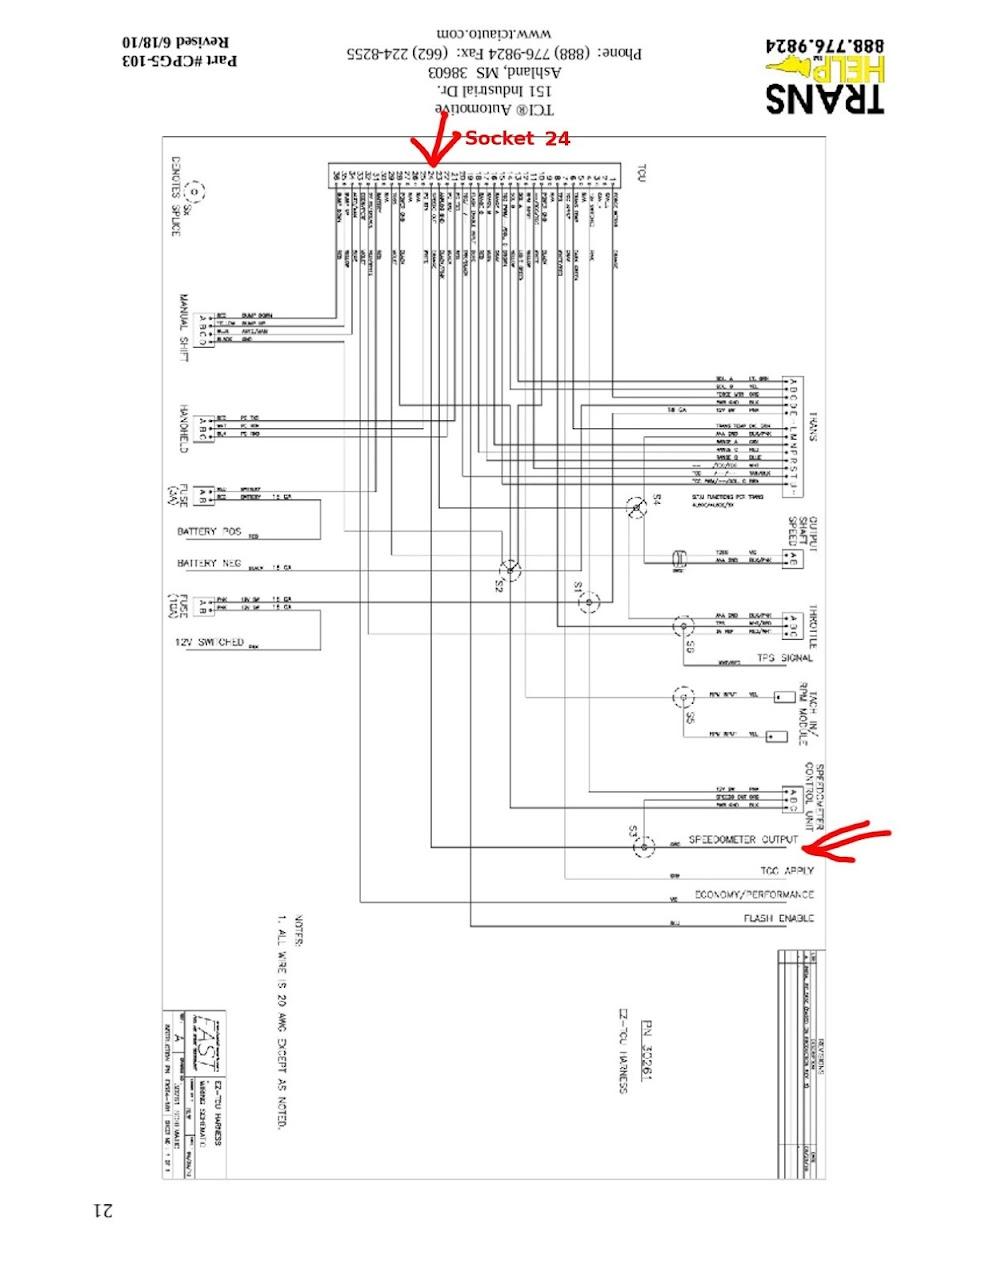 ez tcu wiring diagrams 2 fut feba arbeitsvermittlung de \u2022bmw tcu wiring diagram named foneplanet de u2022 rh named foneplanet de ez car wiring diagram